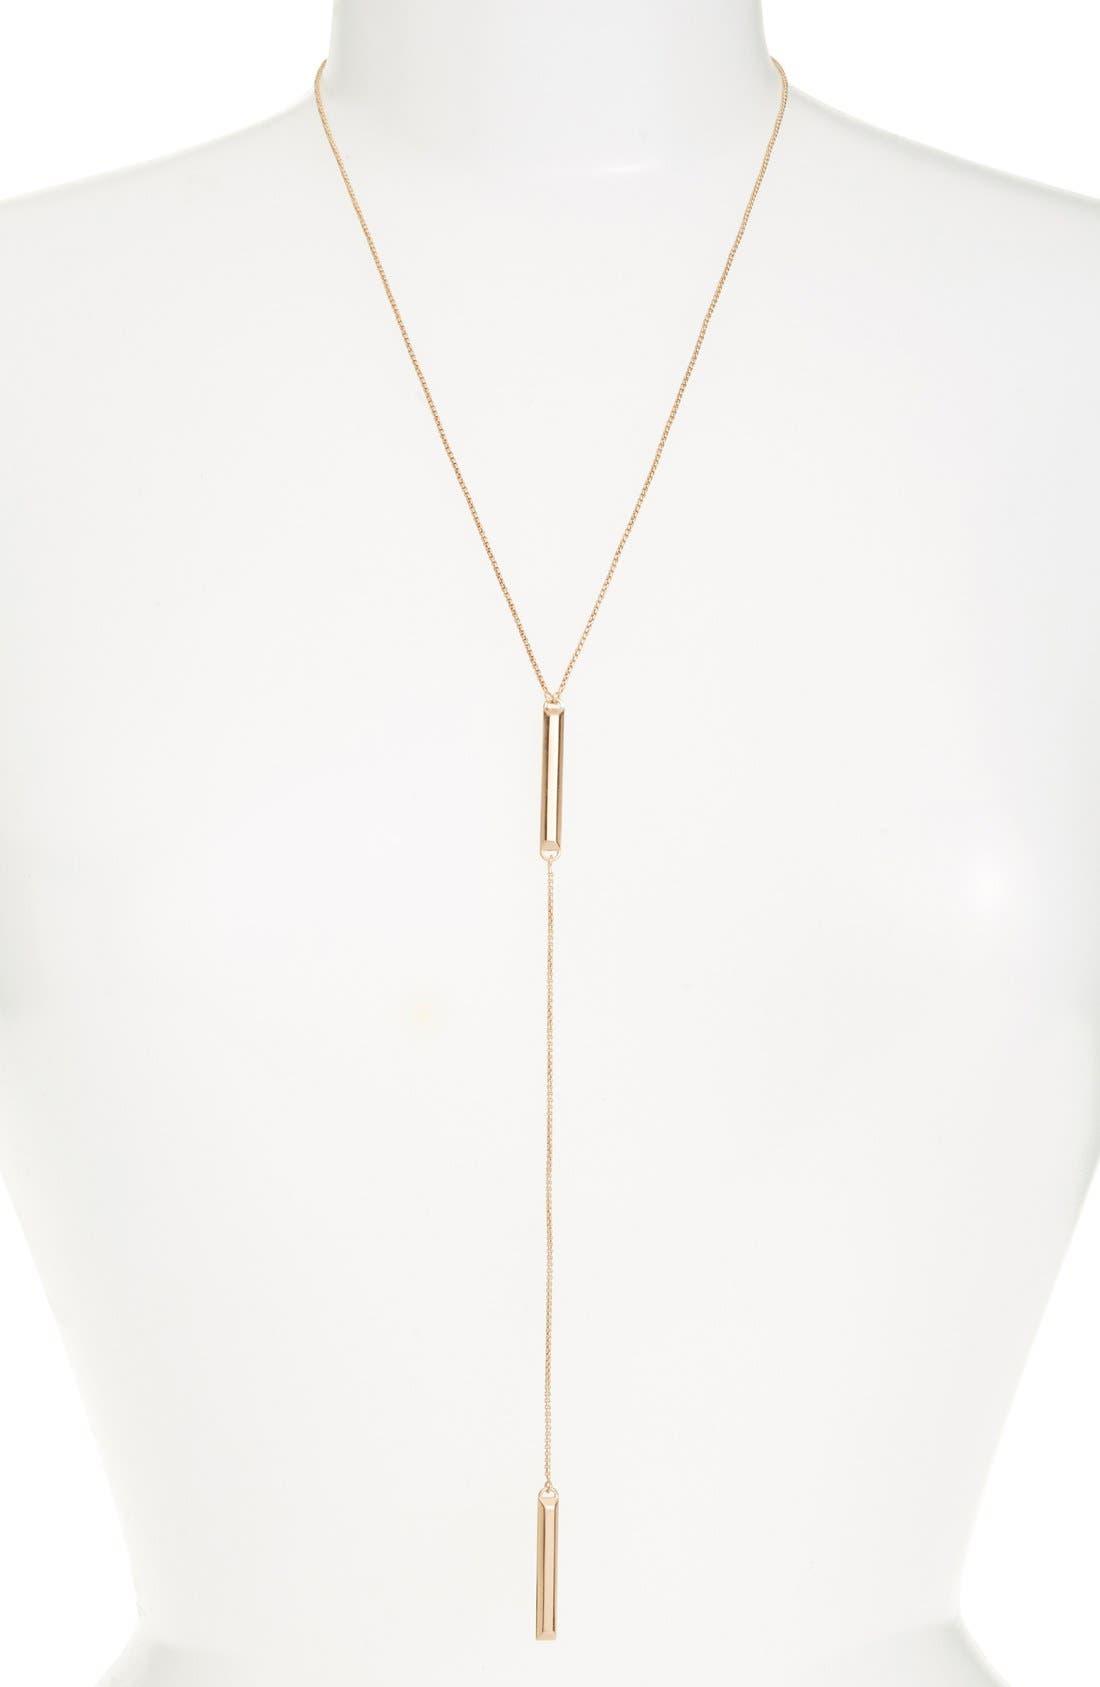 Kendra Scott 'Shelton' Y-Necklace